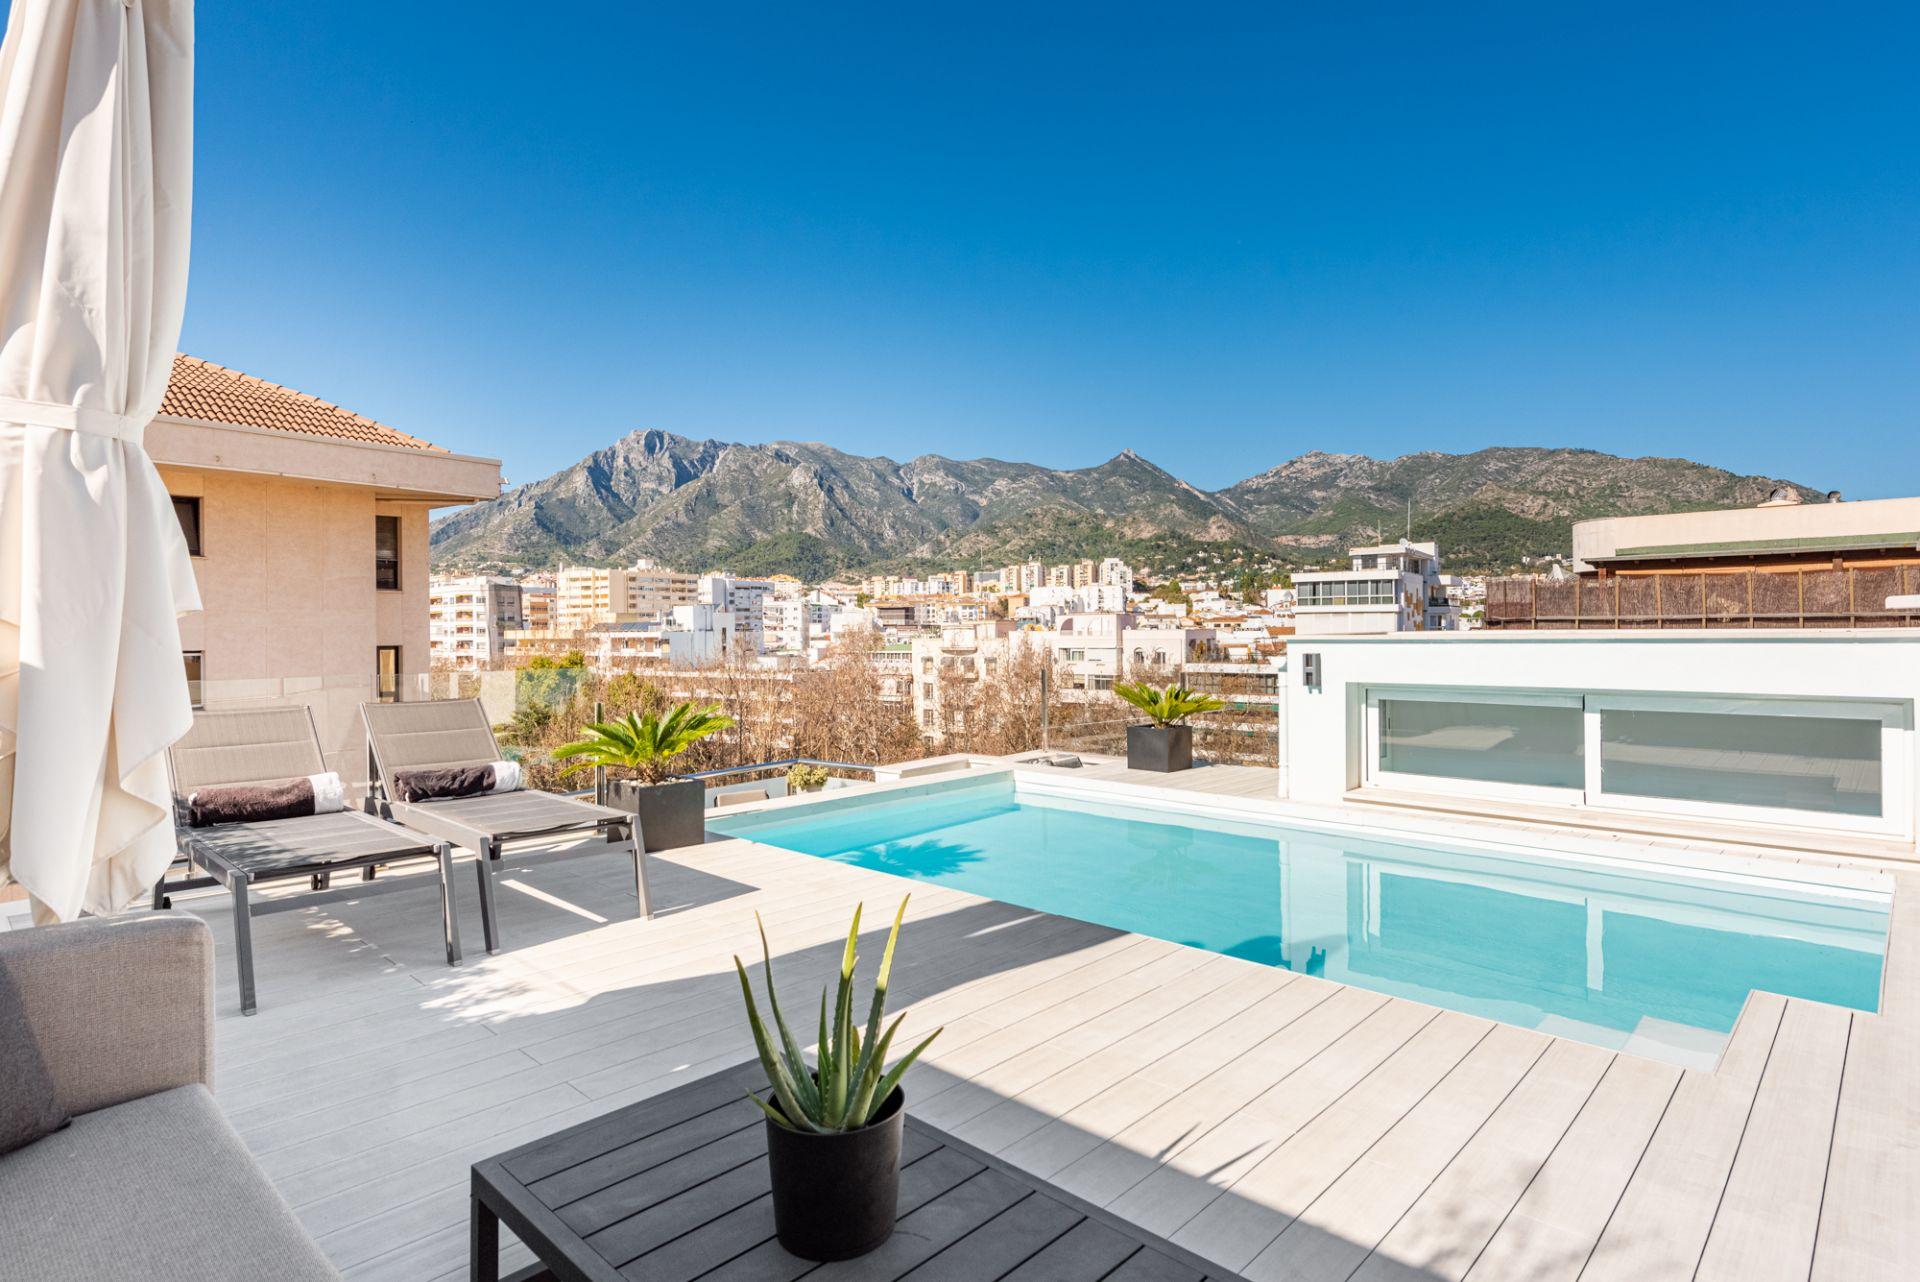 Duplex Penthouse in Marbella, Marbella